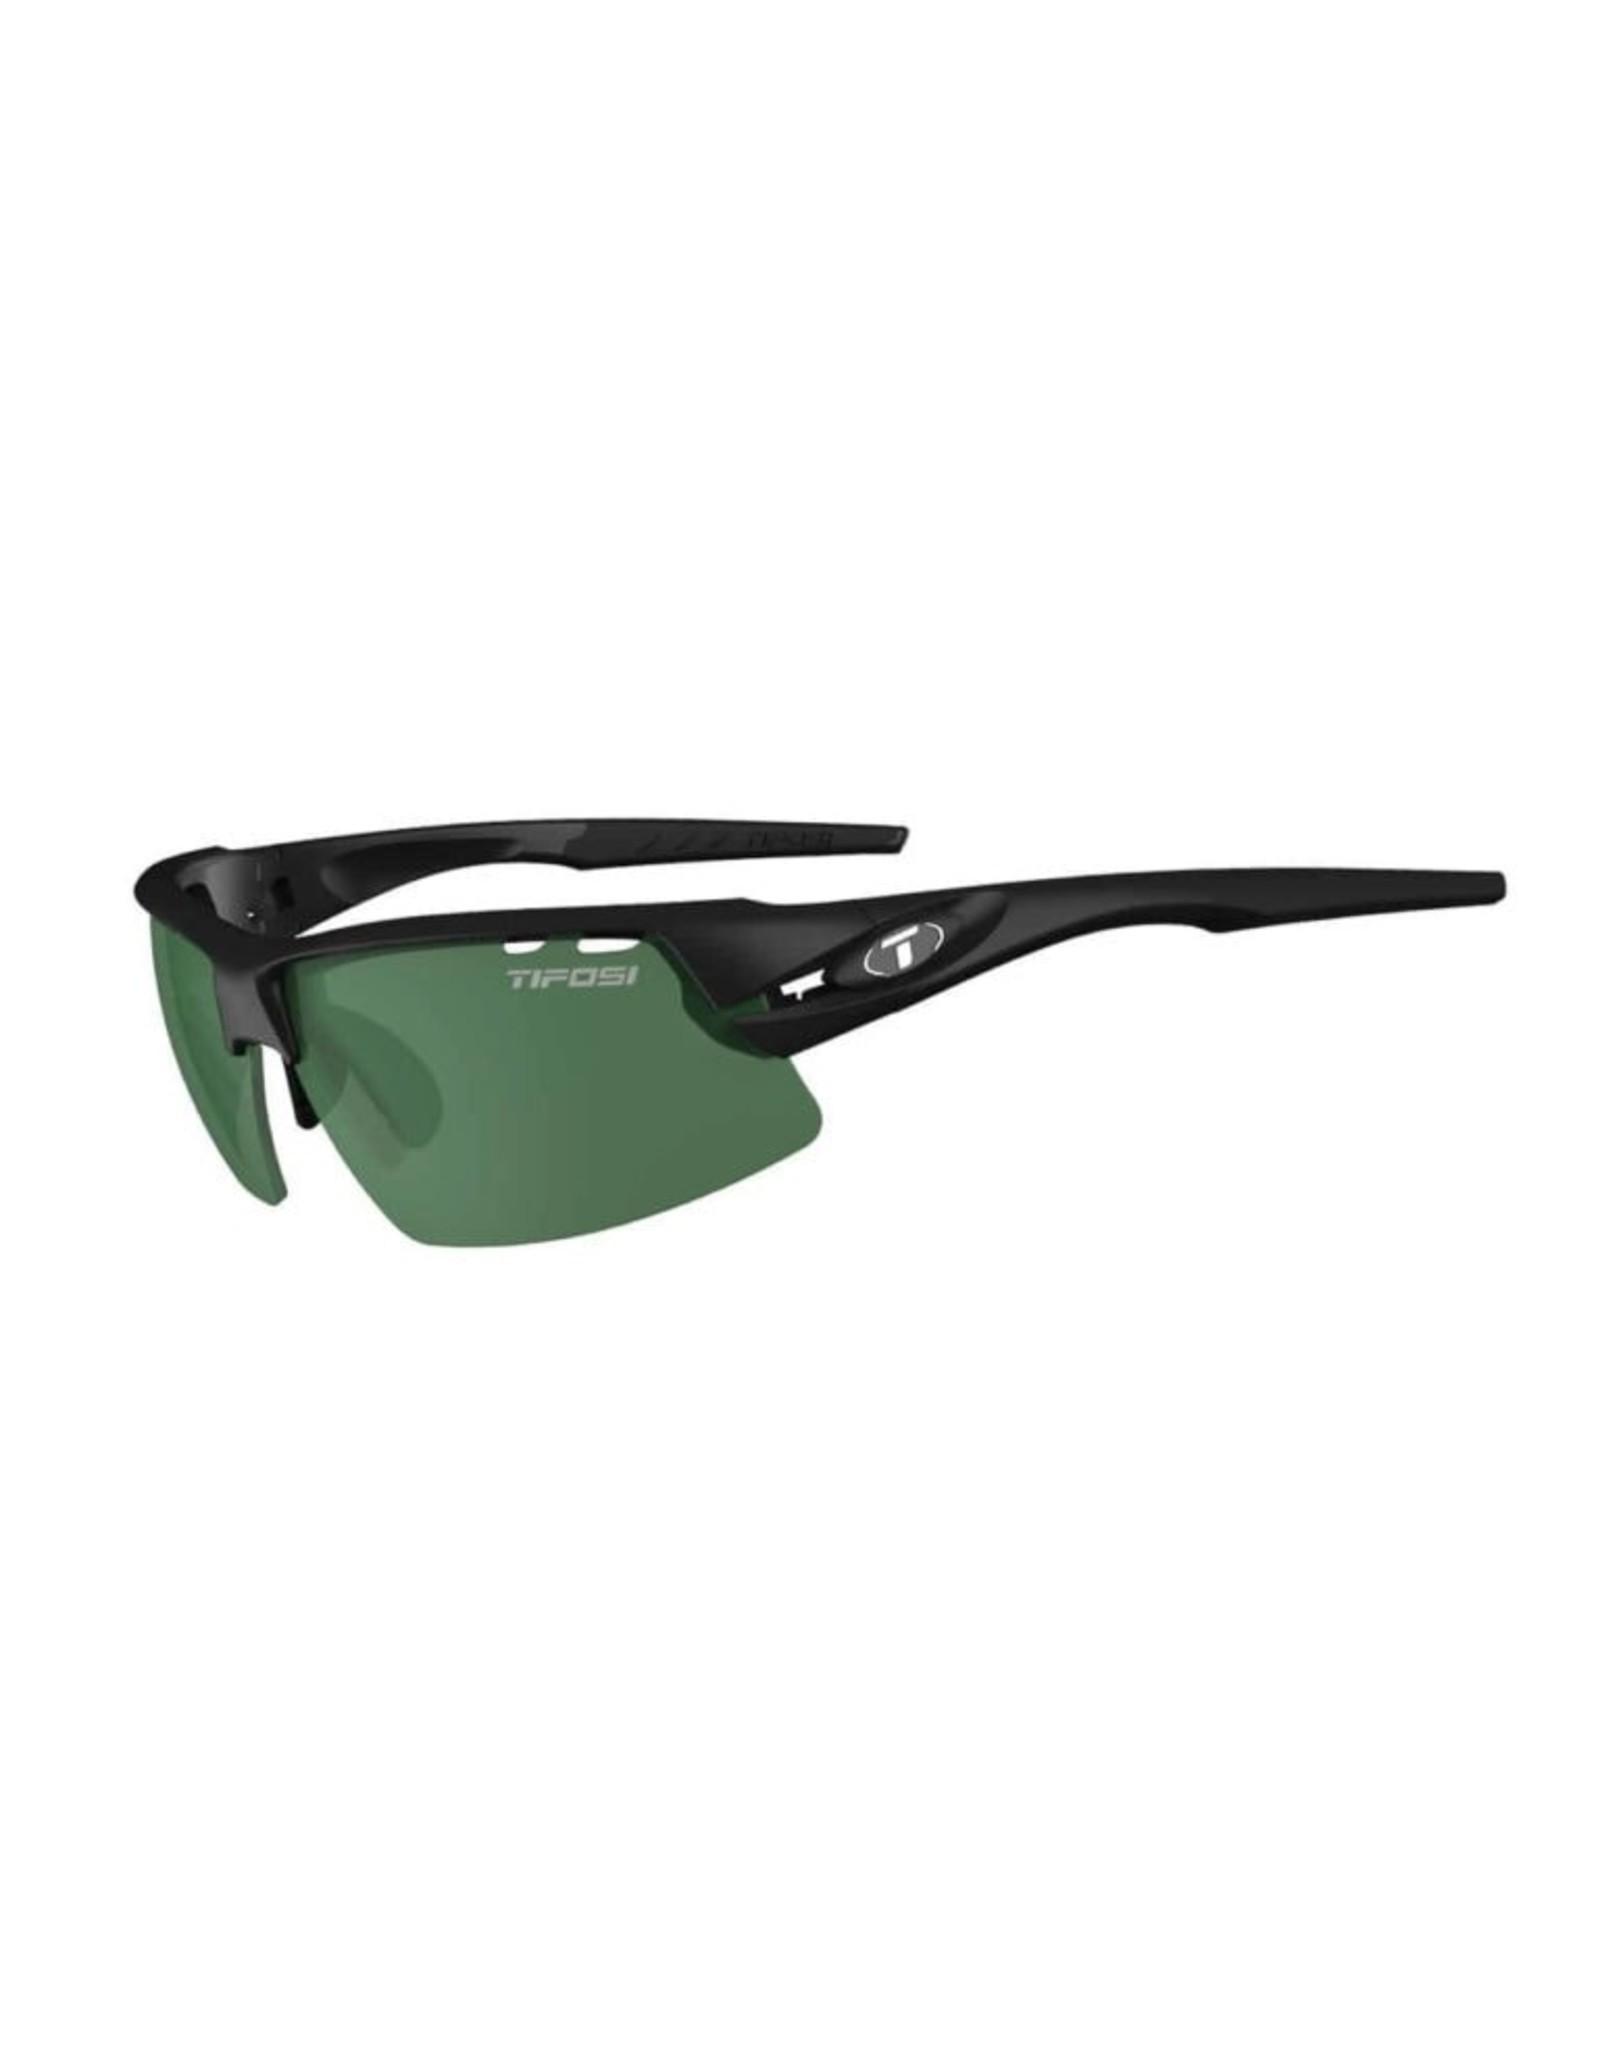 Tifosi Optics Crit, Matte Black Single Lens Sunglasses - Enliven Golf